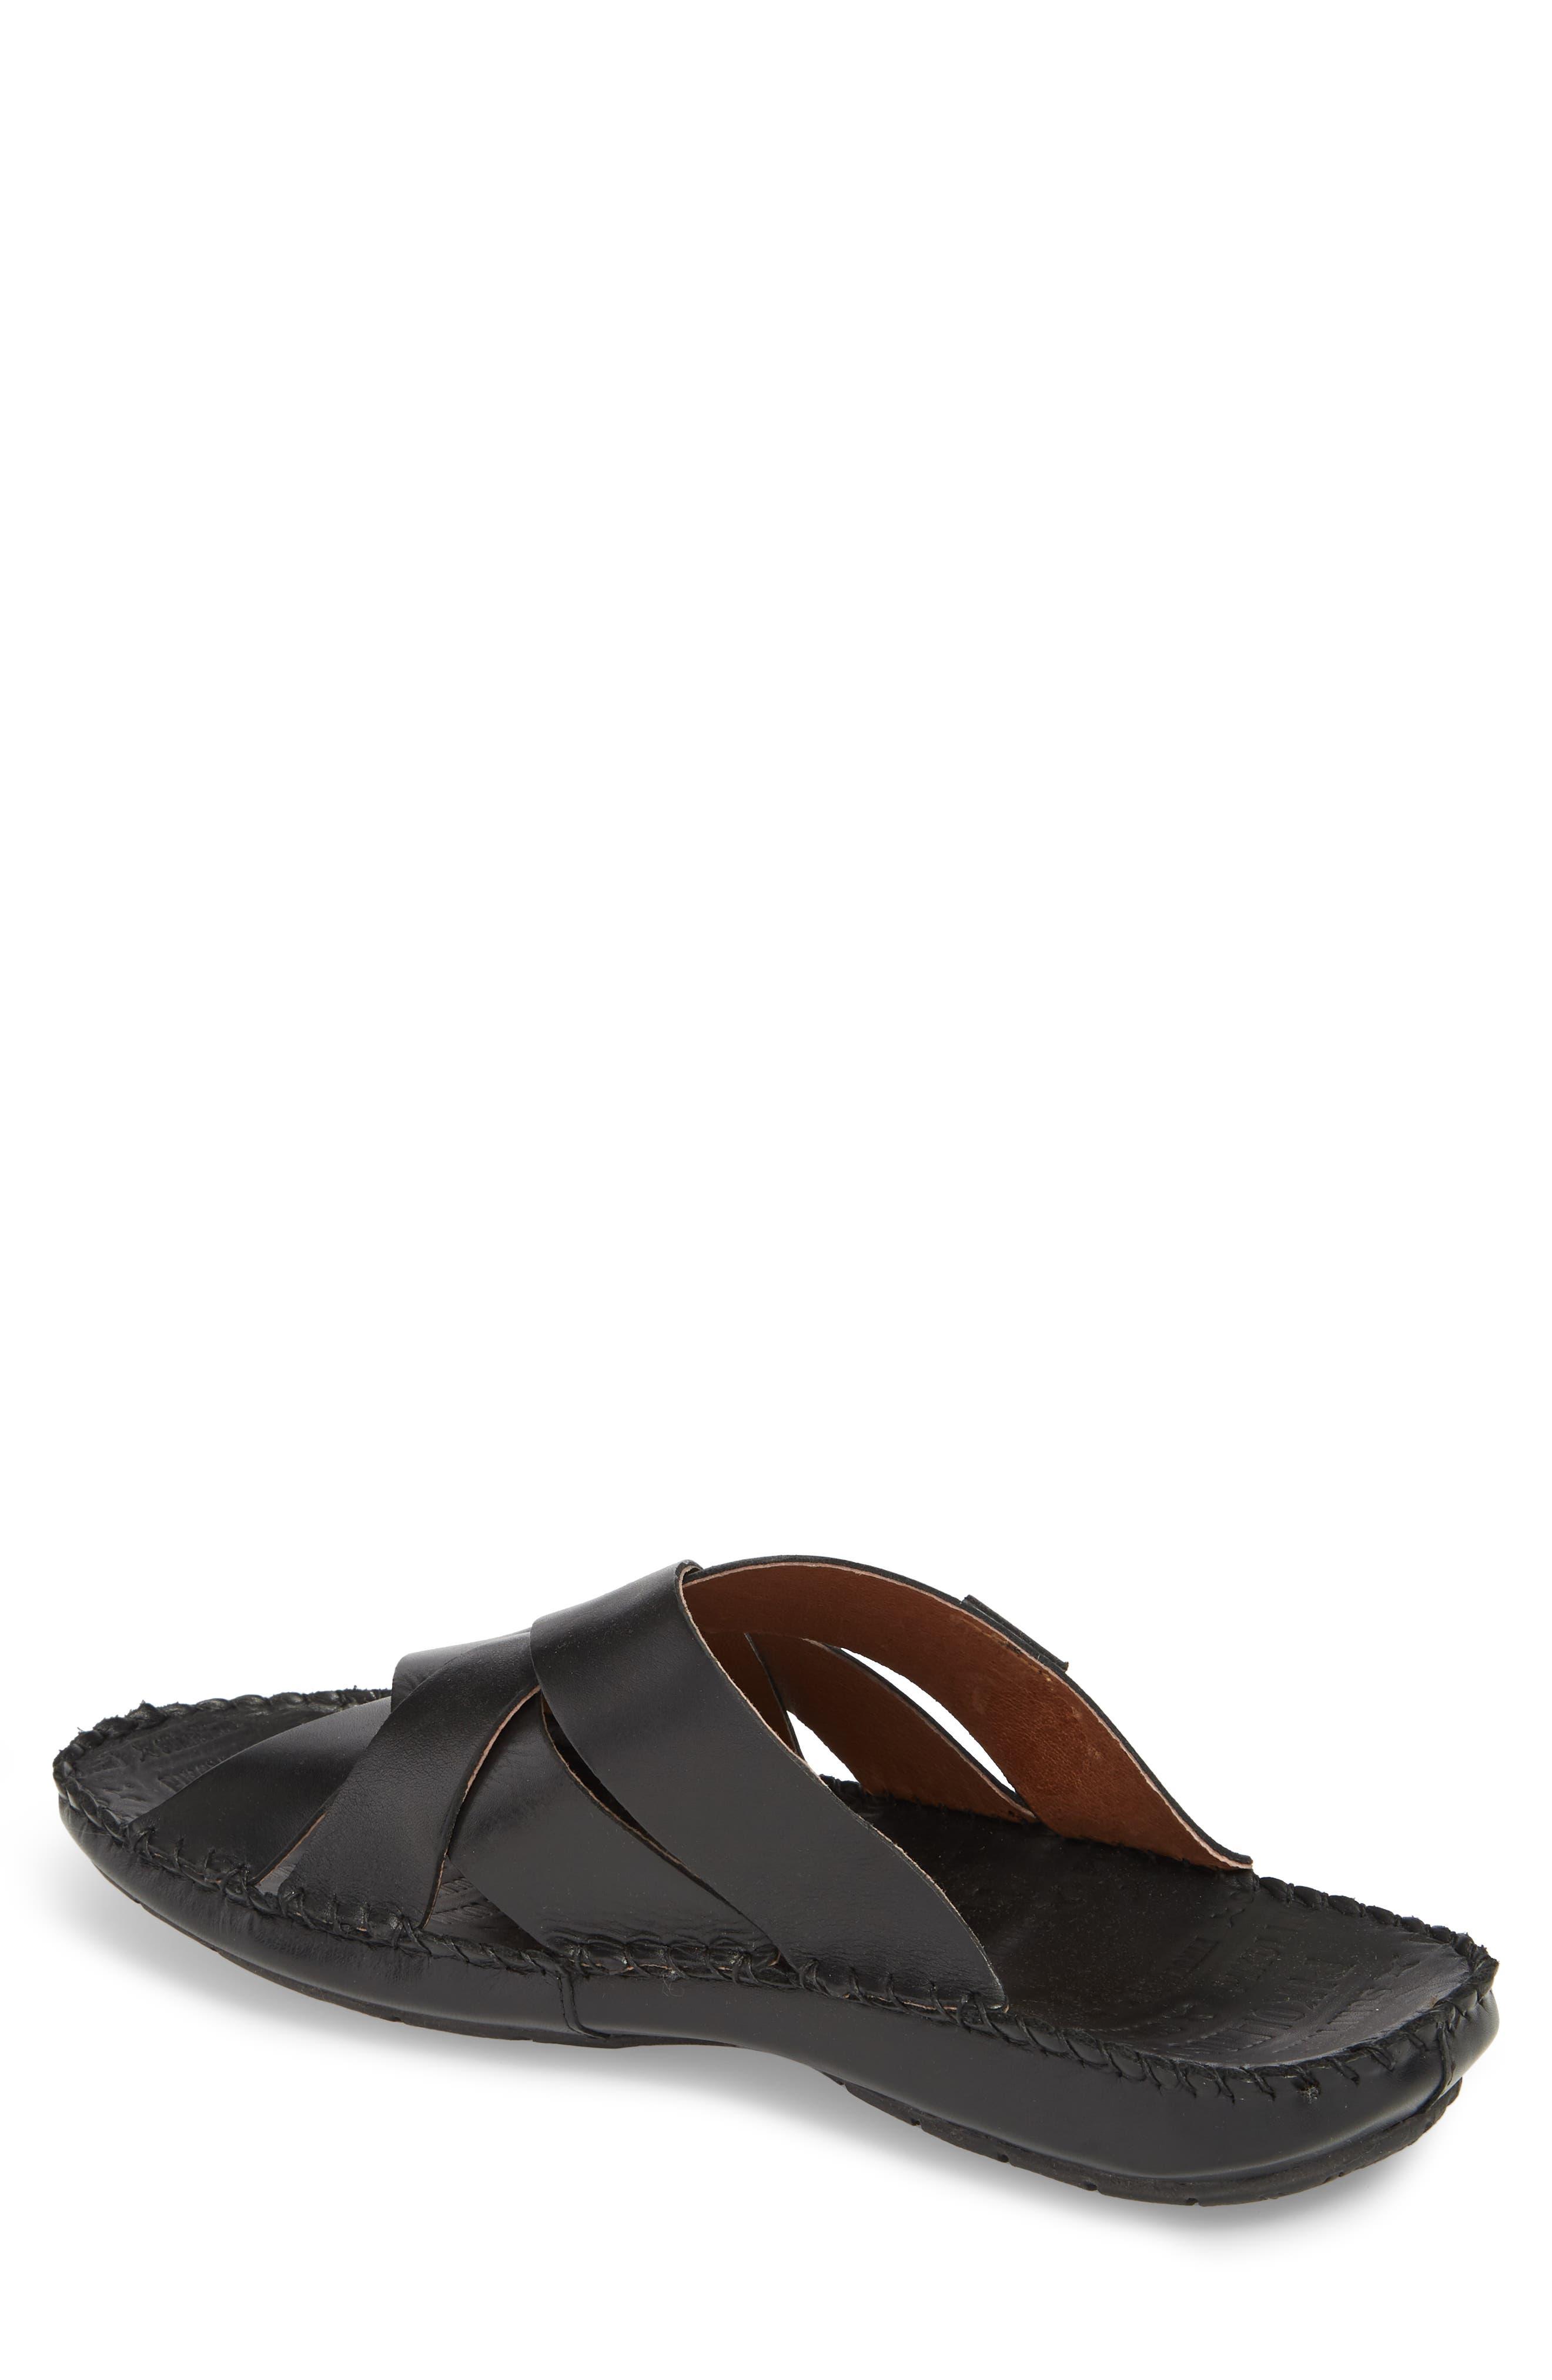 'Tarifa' Slide Sandal,                             Alternate thumbnail 2, color,                             Black Leather